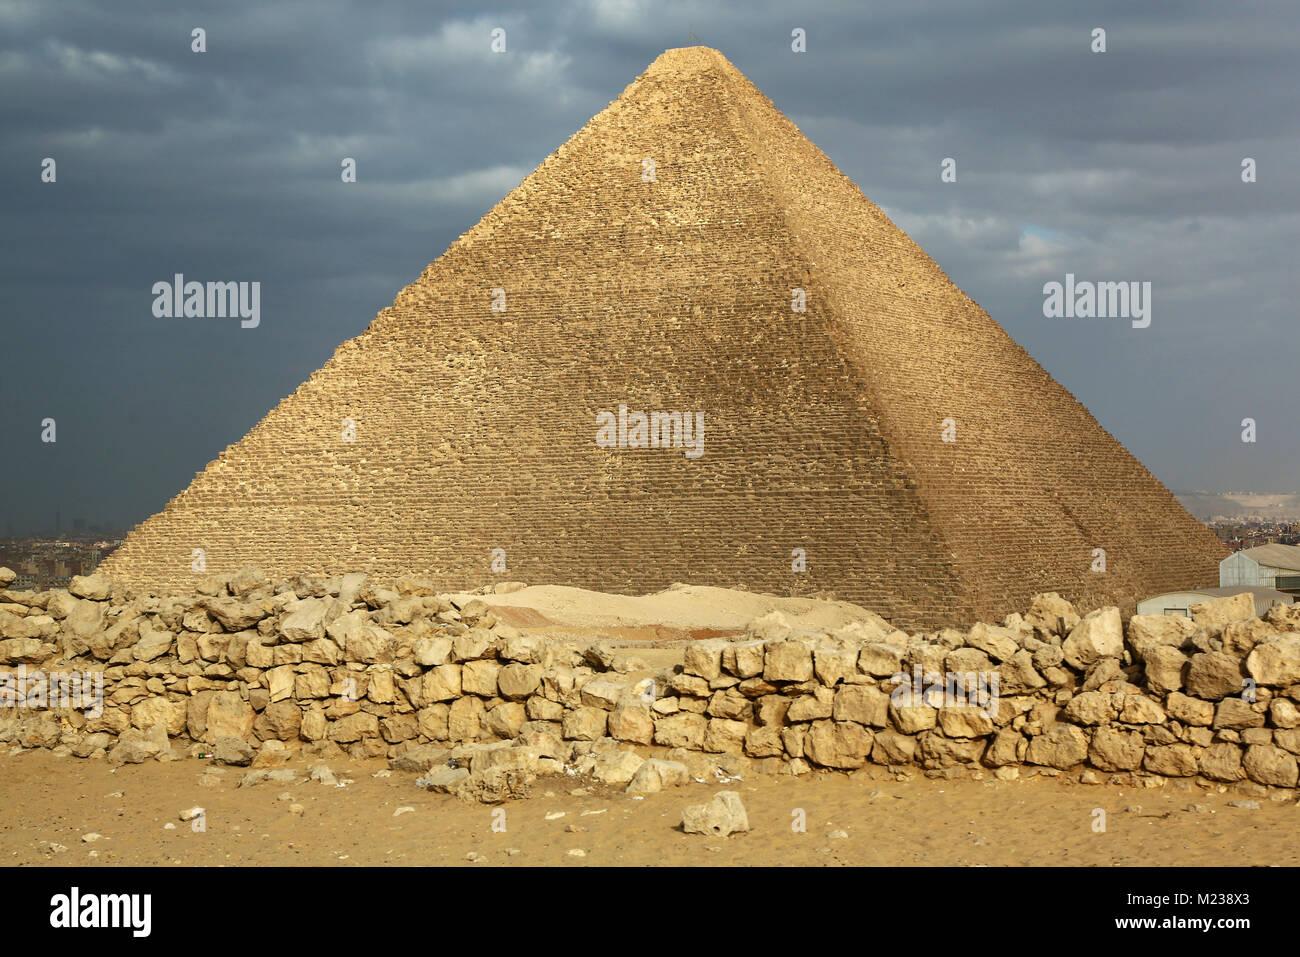 La Gran Pirámide de Khufu (Keops) en la meseta de Giza, Cairo, Egipto Imagen De Stock